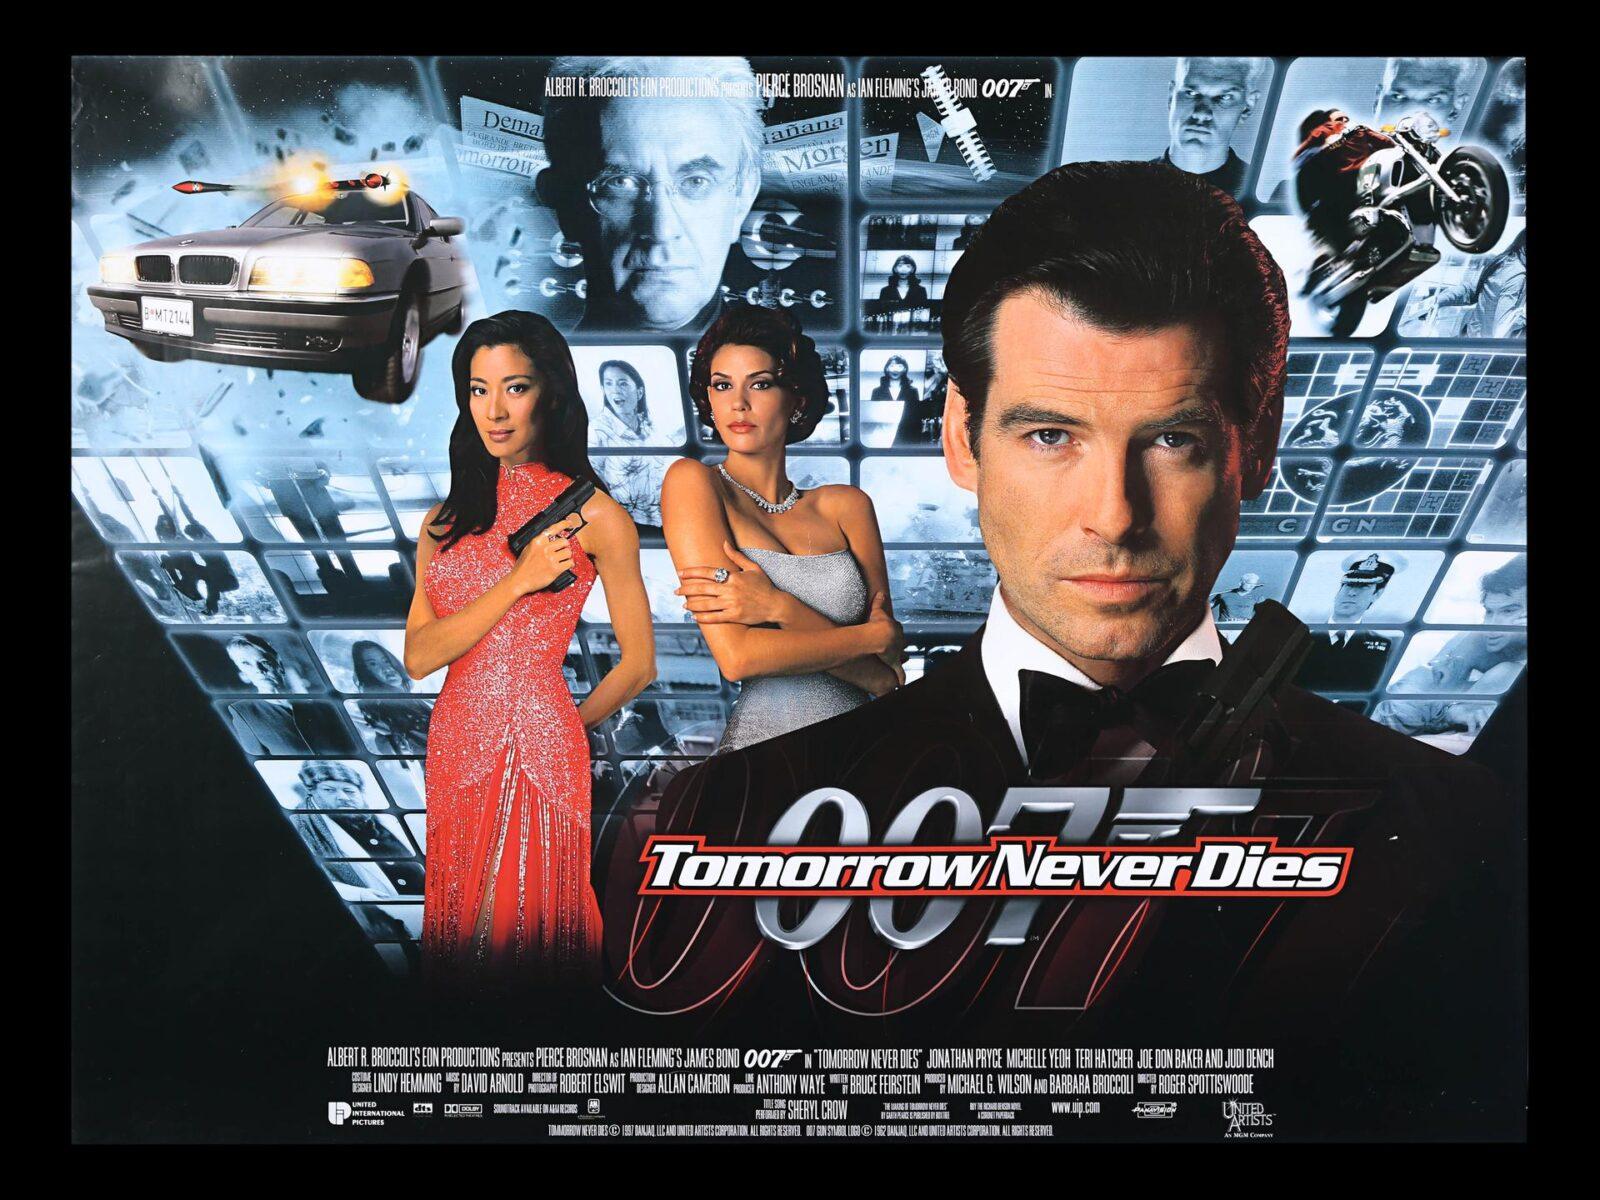 James Bond 007 Films Ranked 18 Tomorrow Never Dies 1997 Bleeding Fool